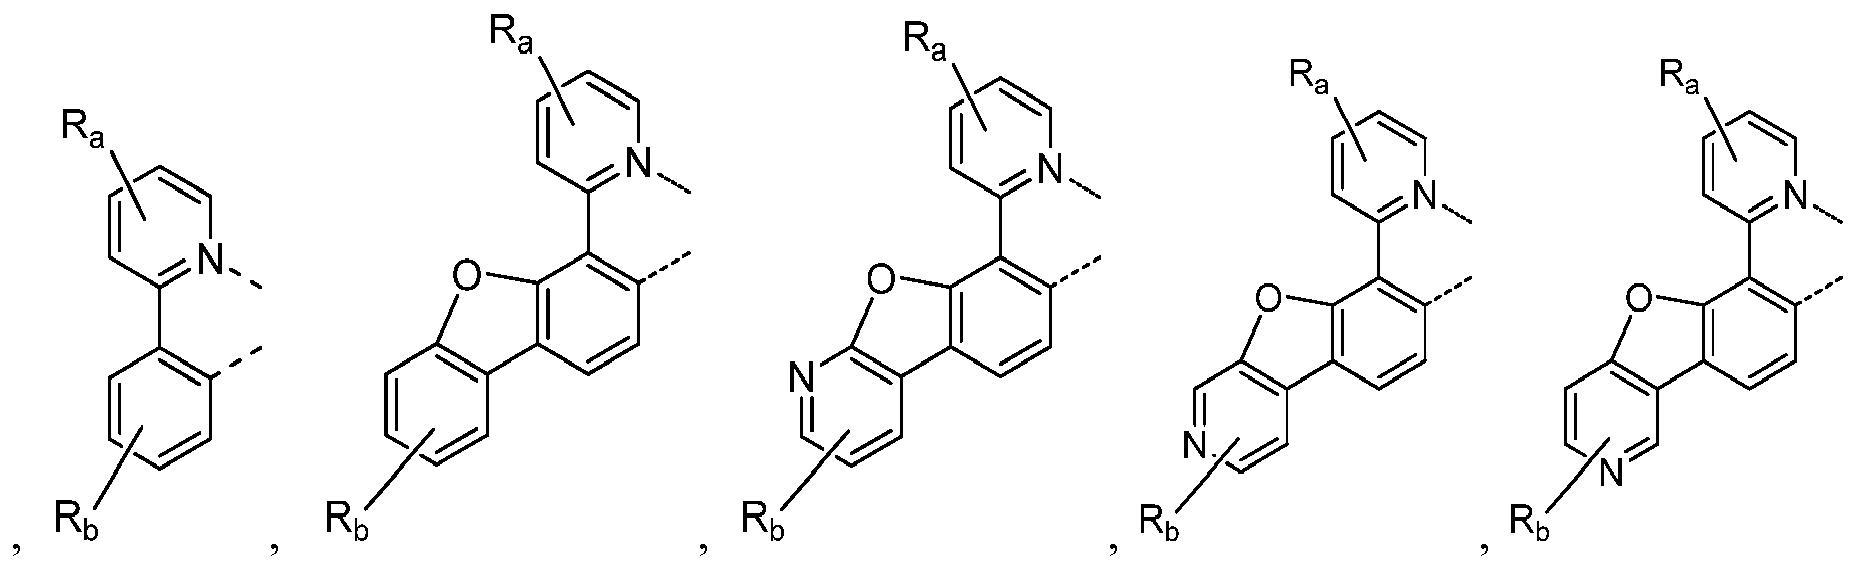 Figure imgb0386